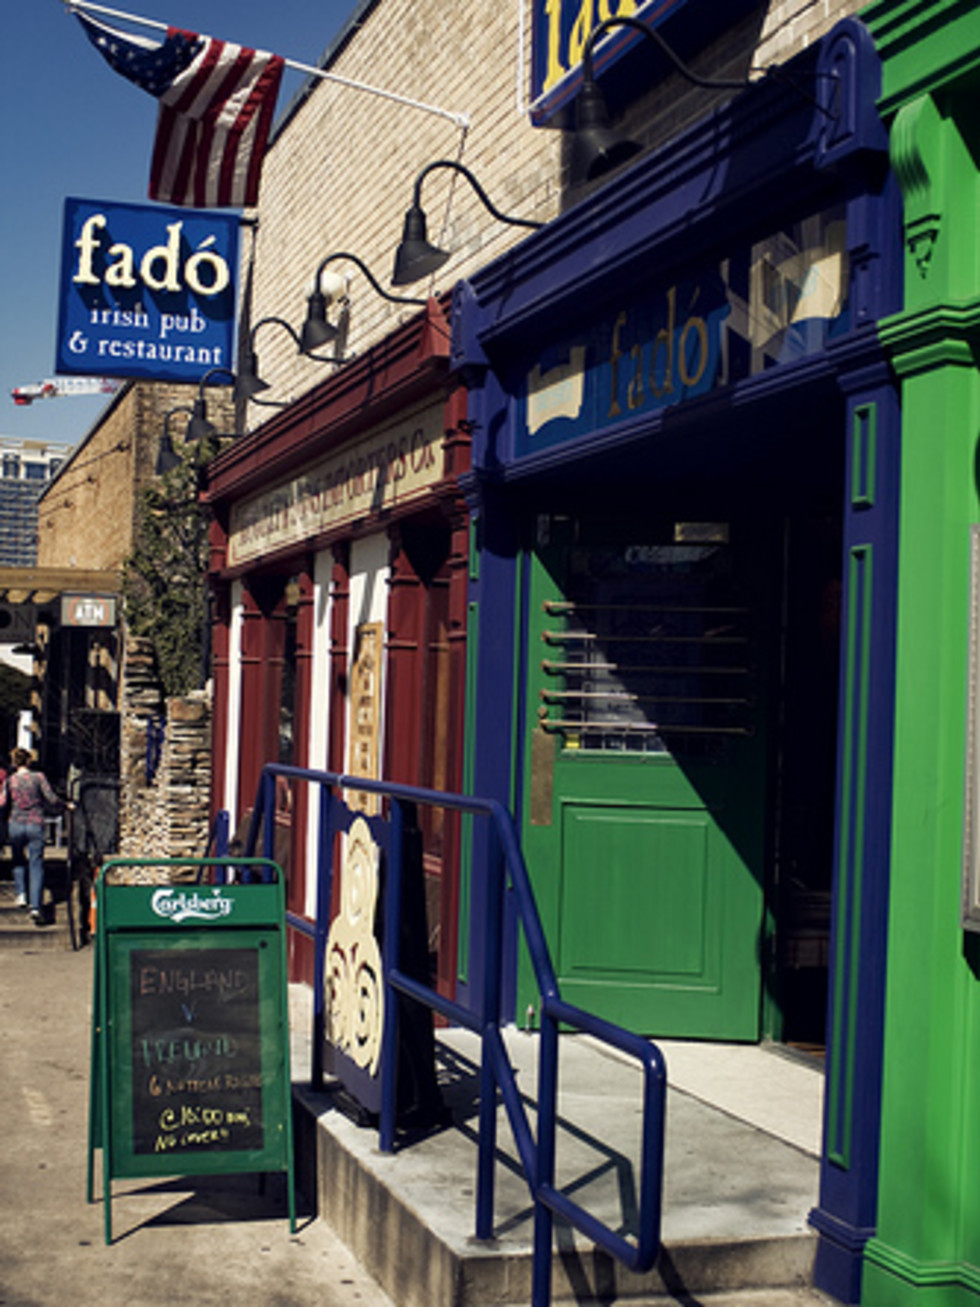 Austin_photo: places_food_fado_exterior